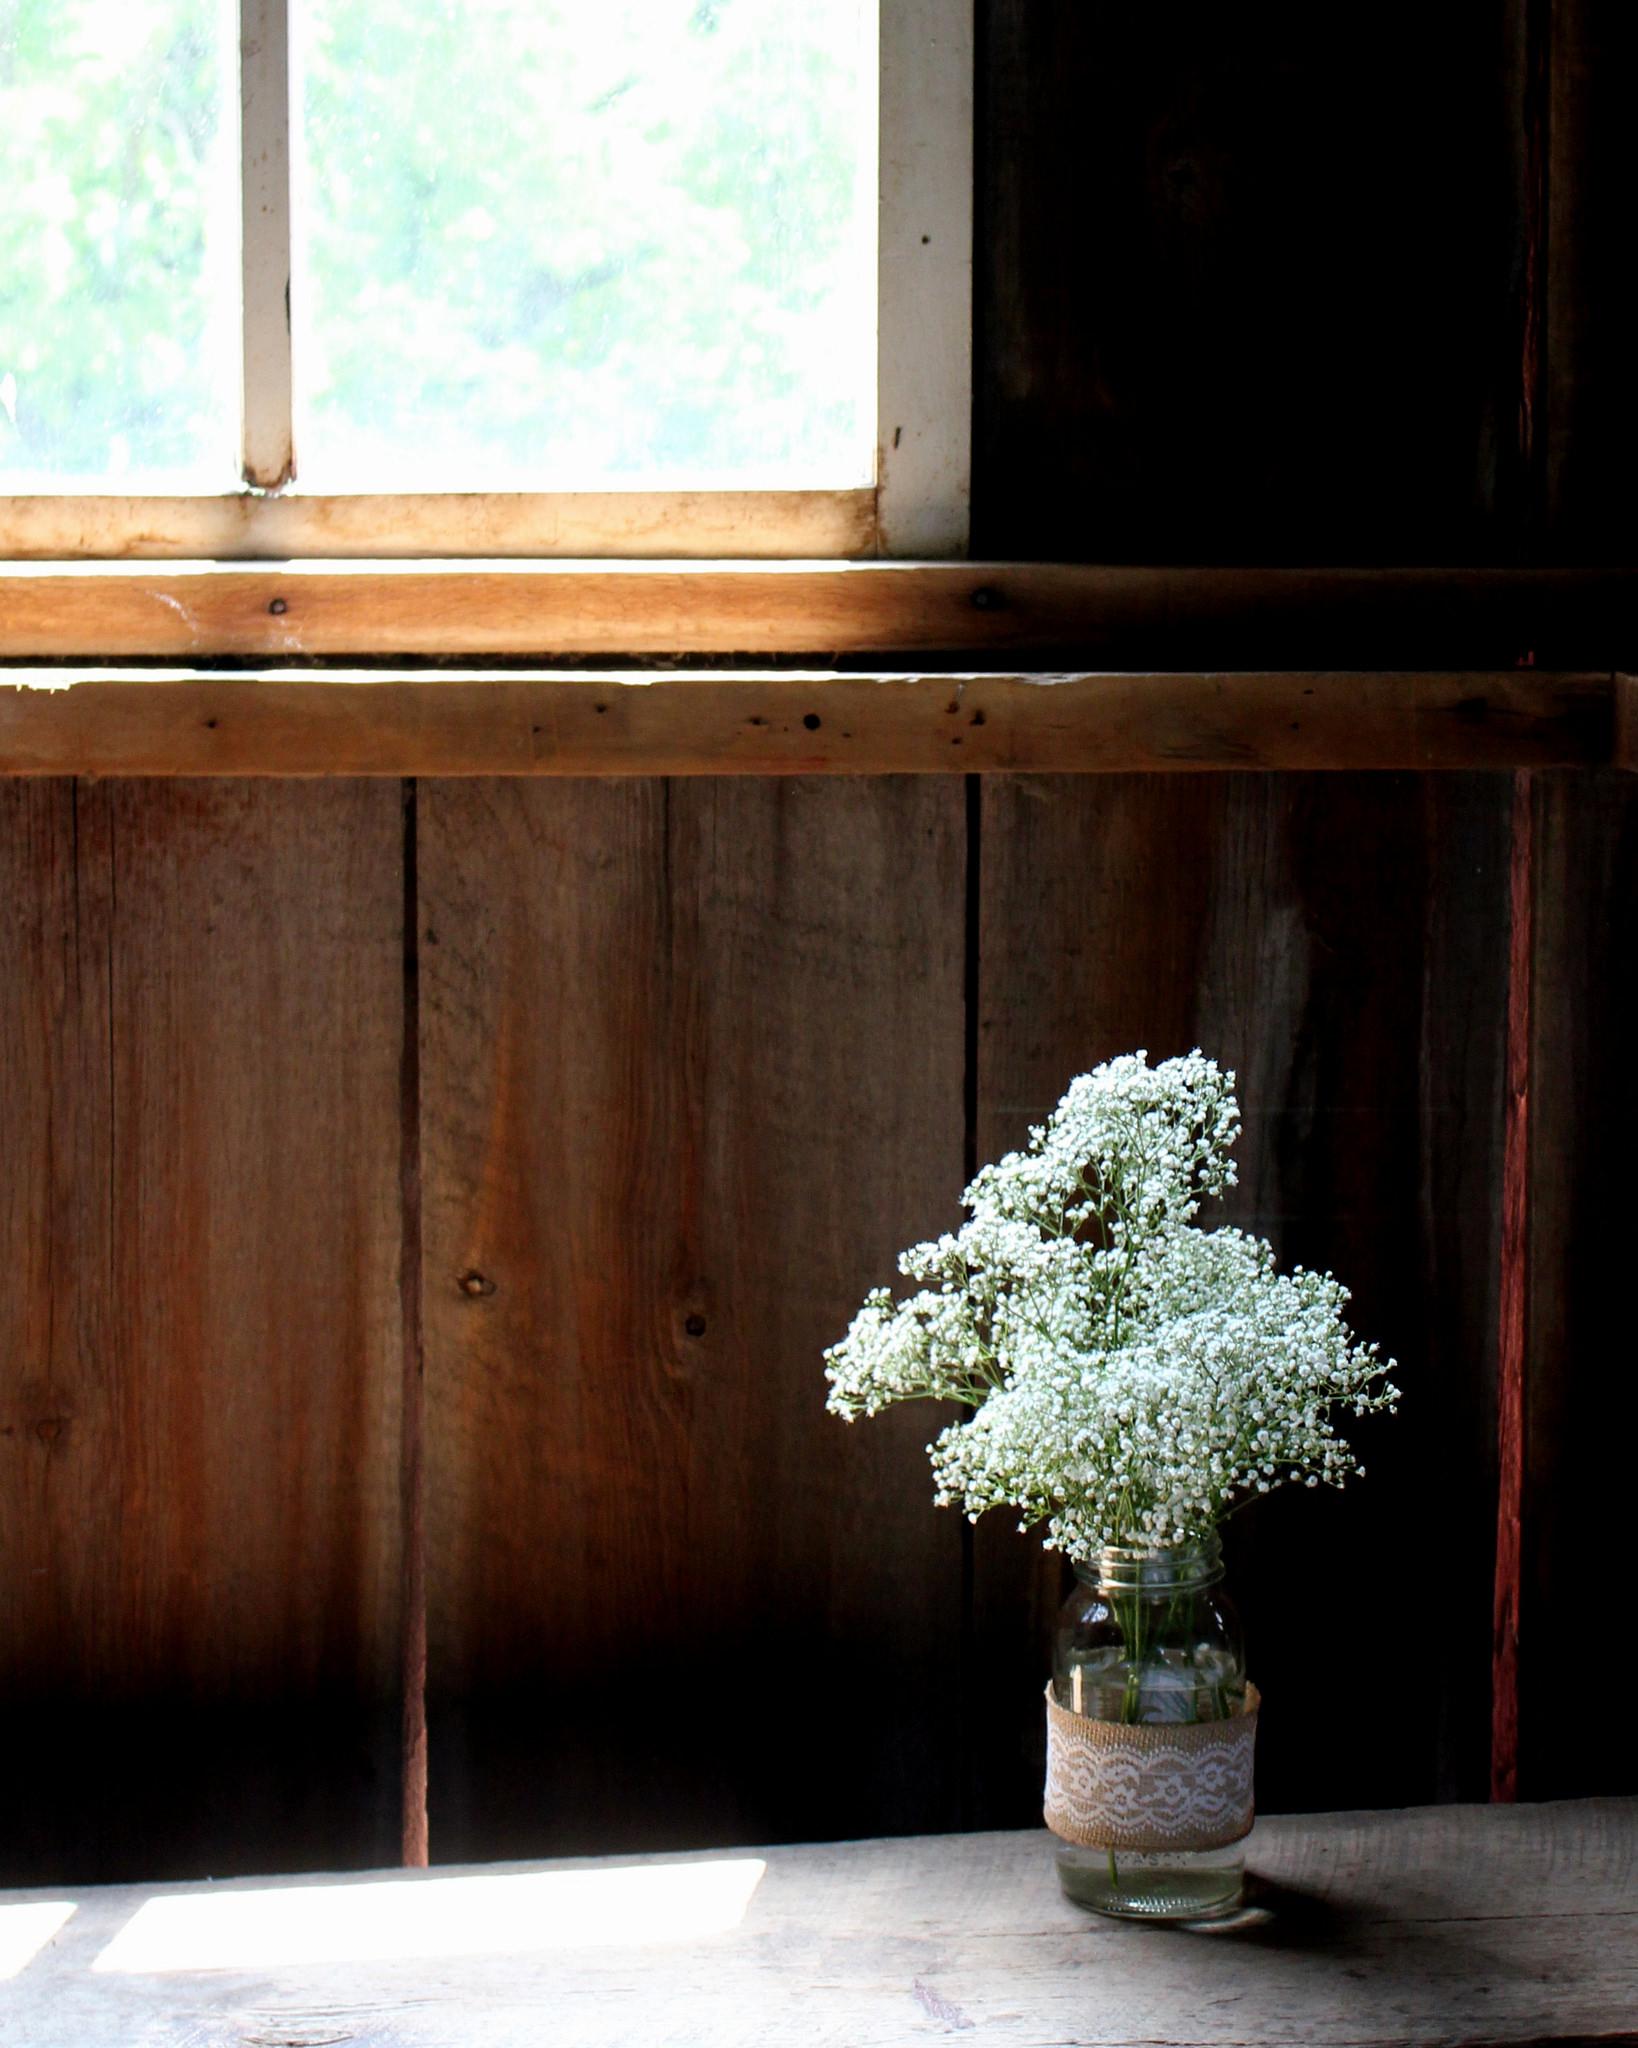 2014 Walnut Grove Farm Weddings - Click here to view!